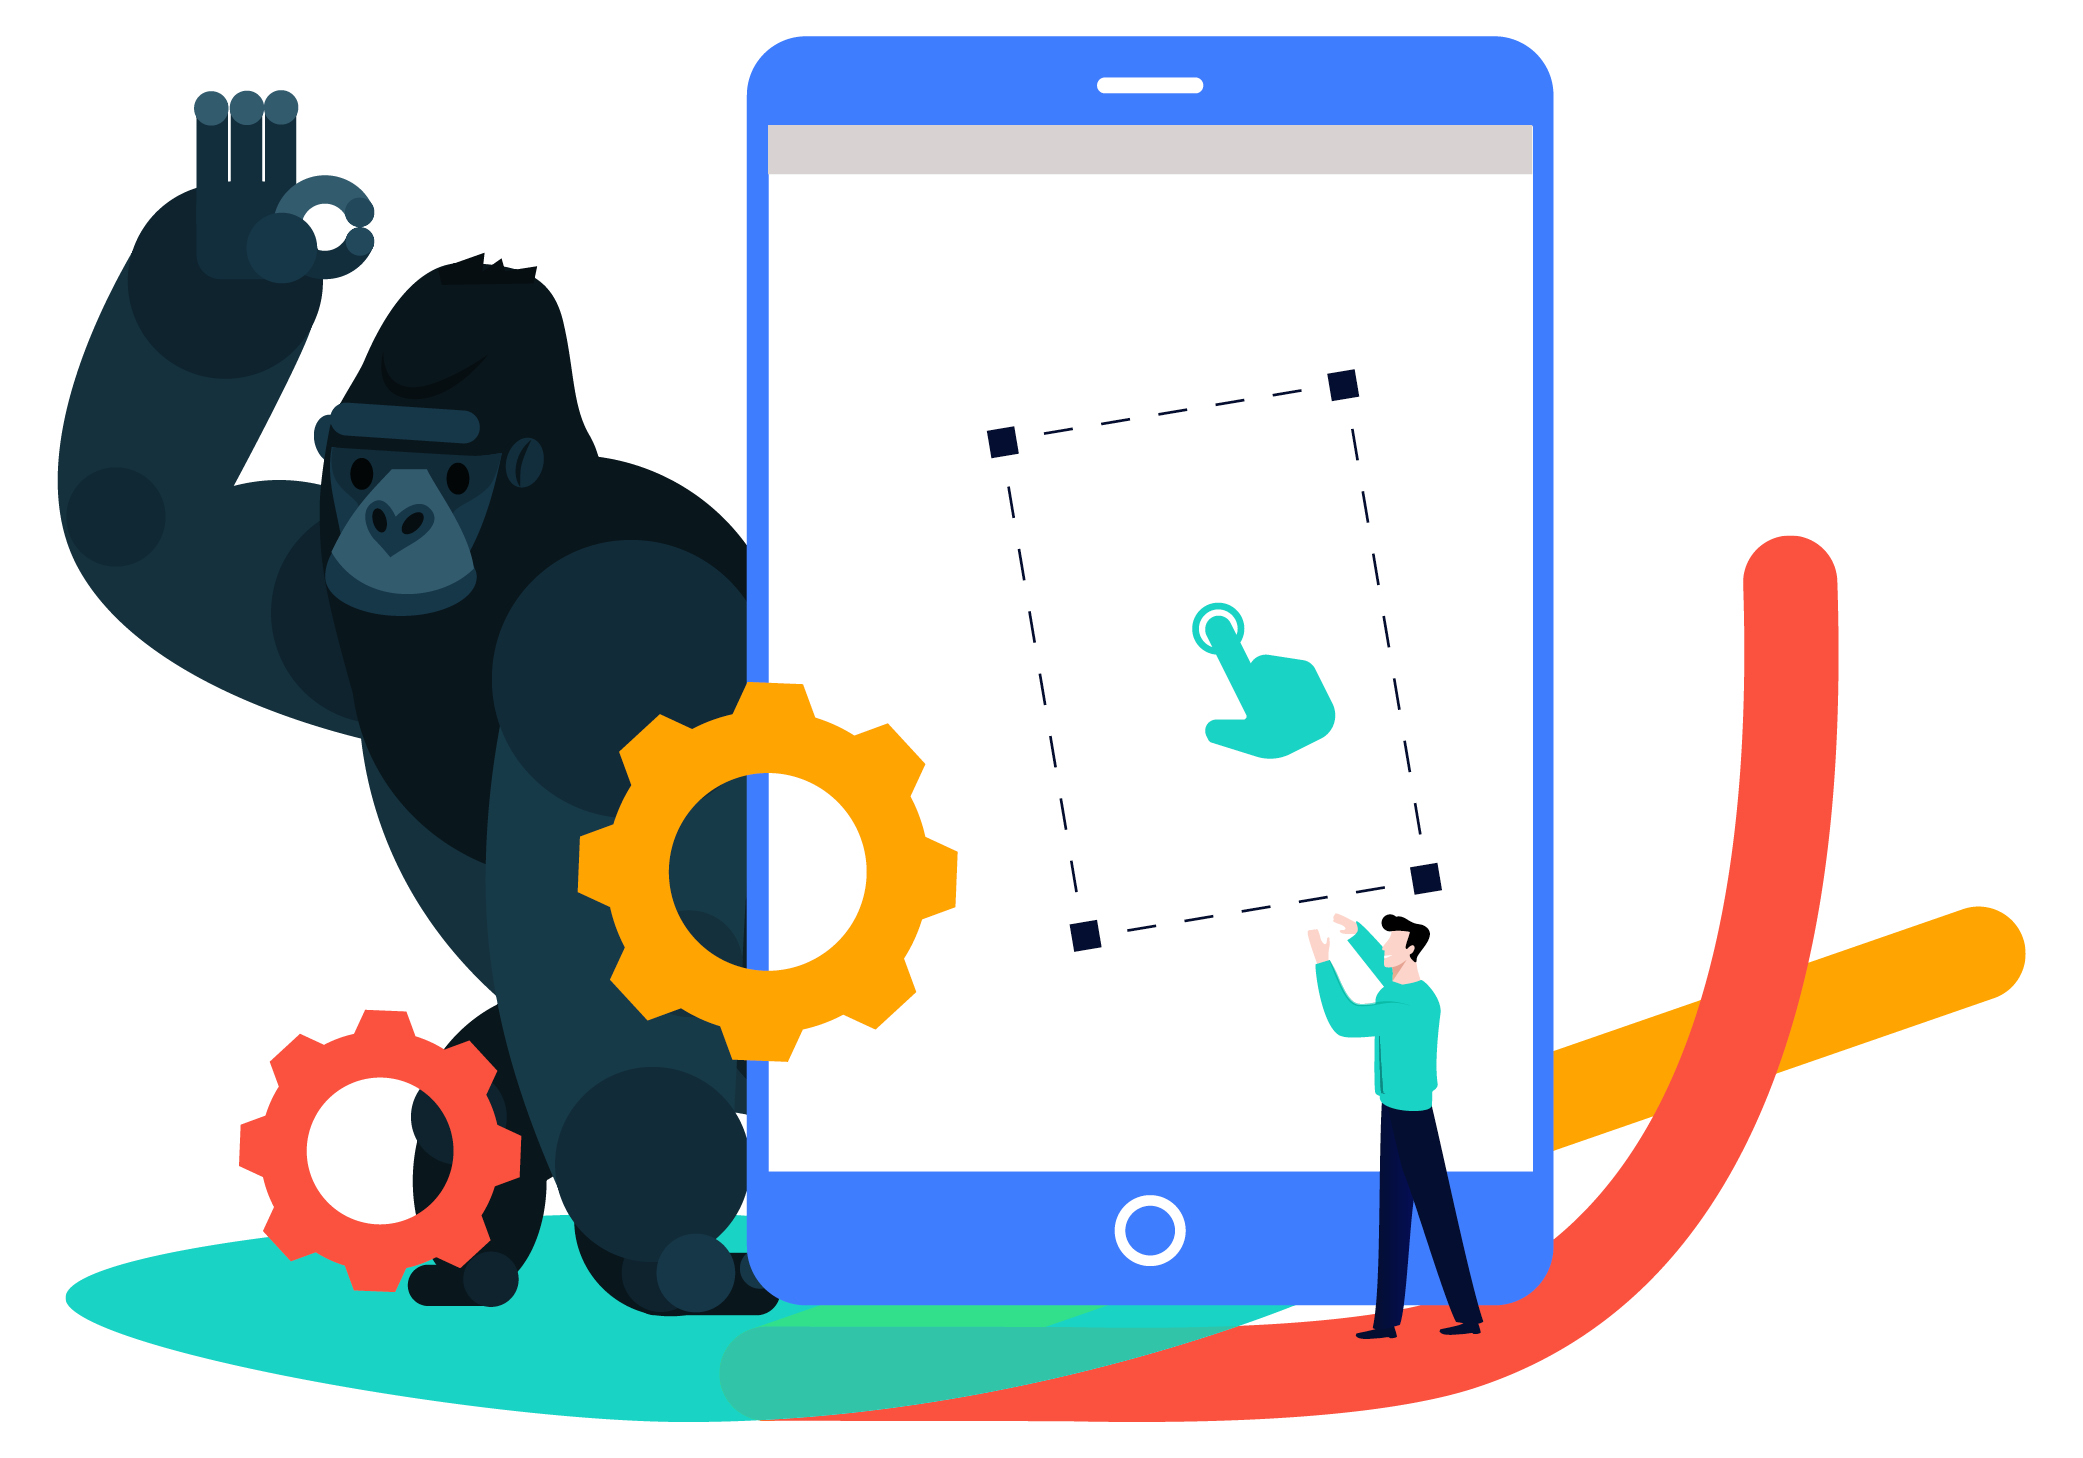 exponentiali-blog-gorilla-arms-inset.jpg